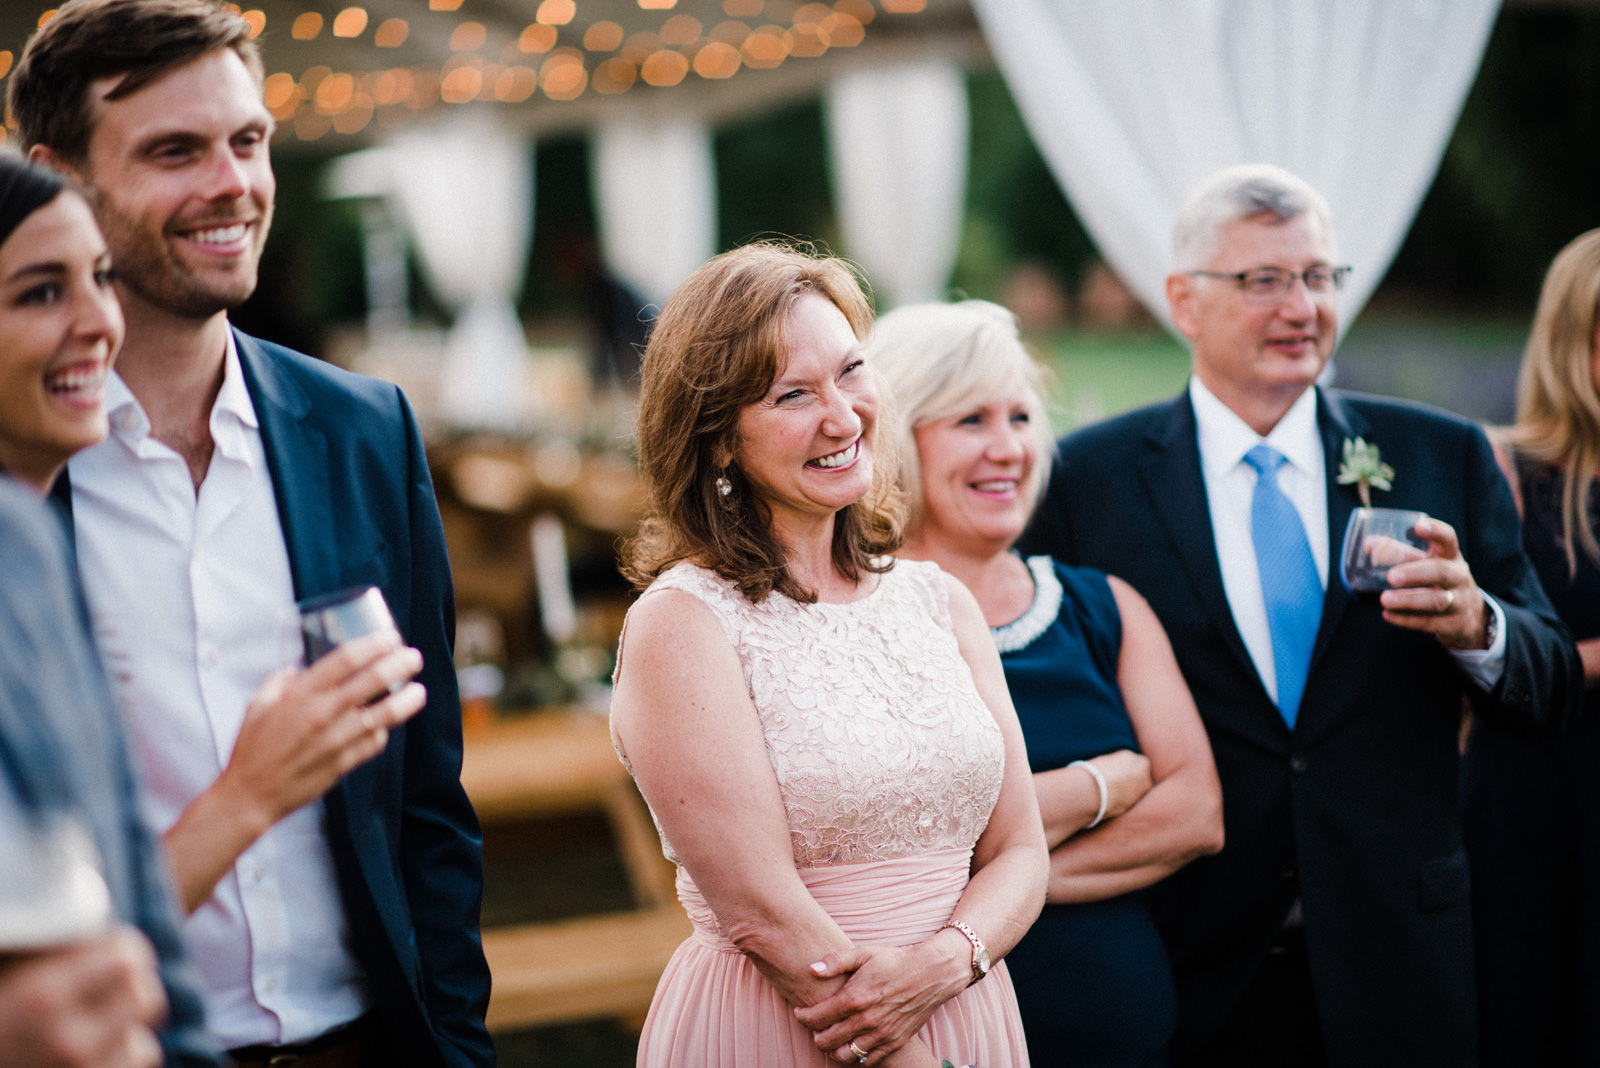 078-woodinville-lavendar-farm-wedding-with-golden-glowy-photos.jpg